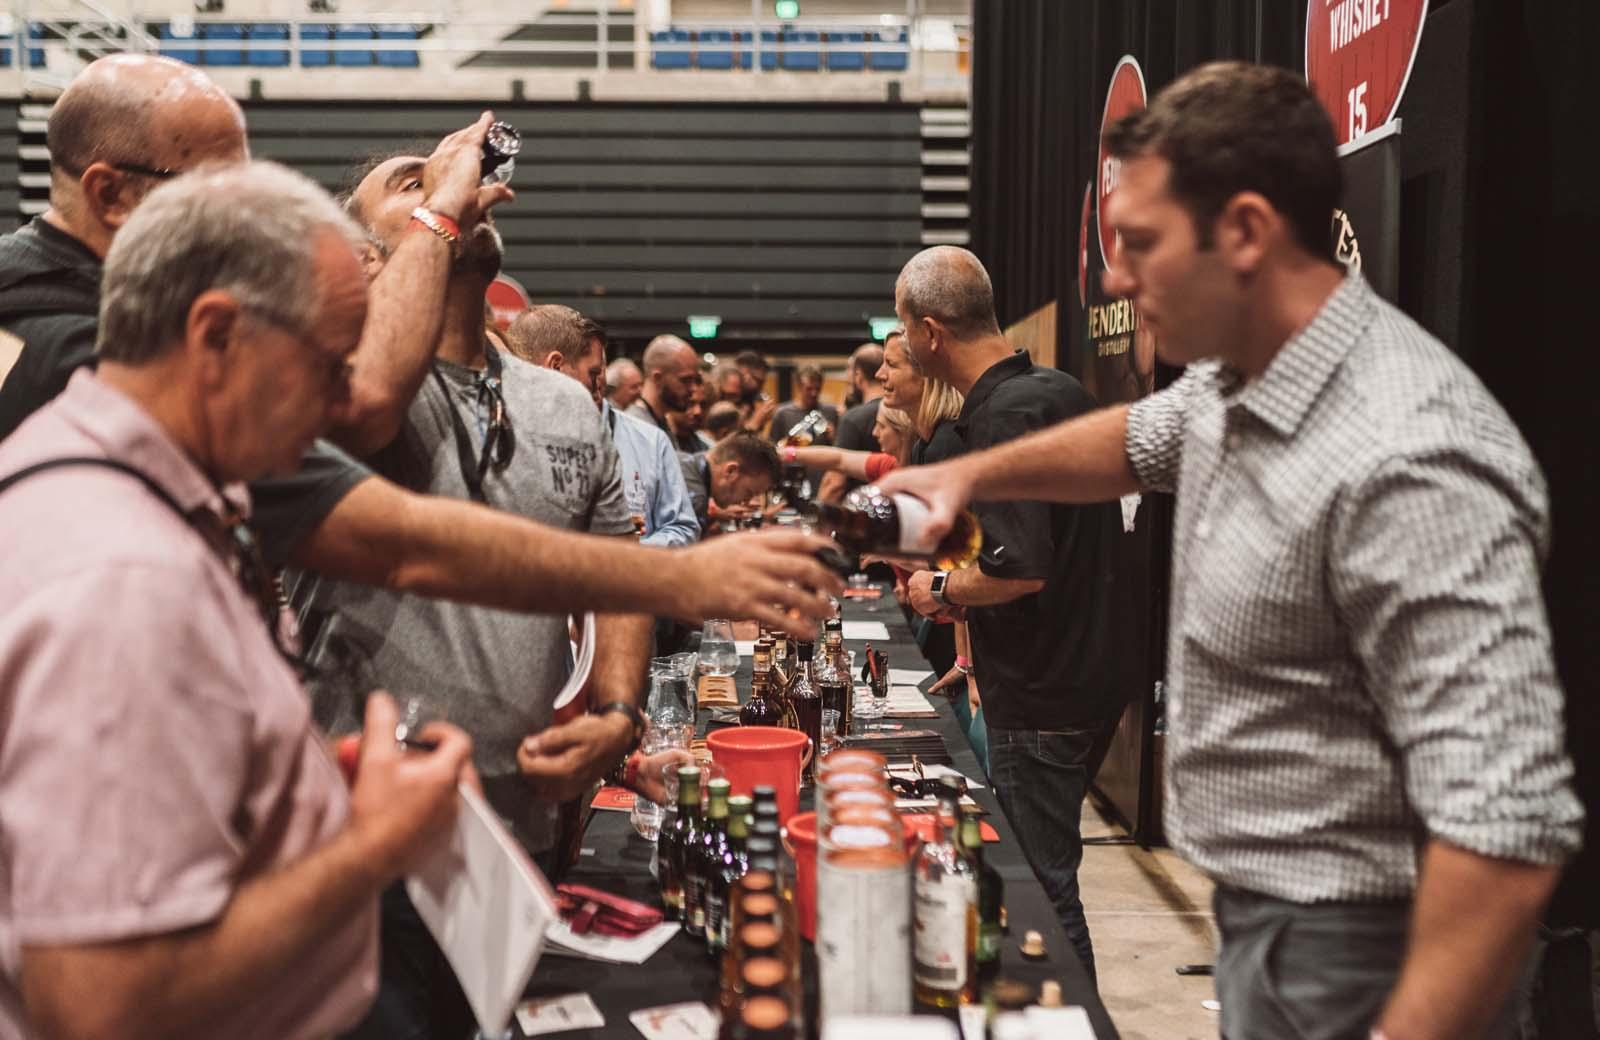 Dramfest 2018 for Whisky Galore-387.jpg